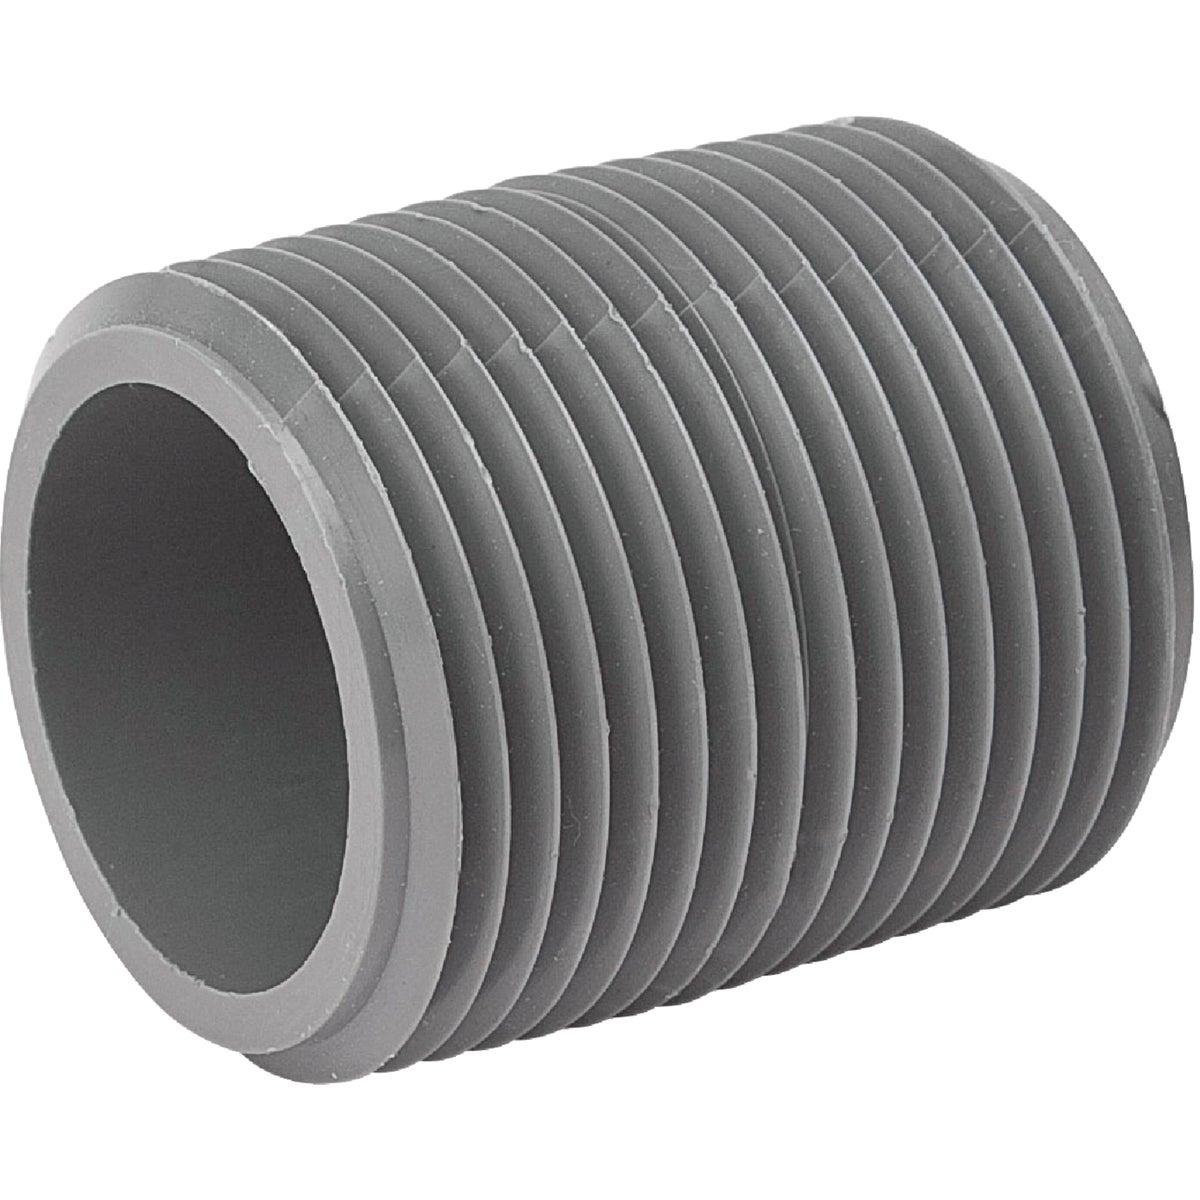 1-1/4XCL PVC NIPPLE